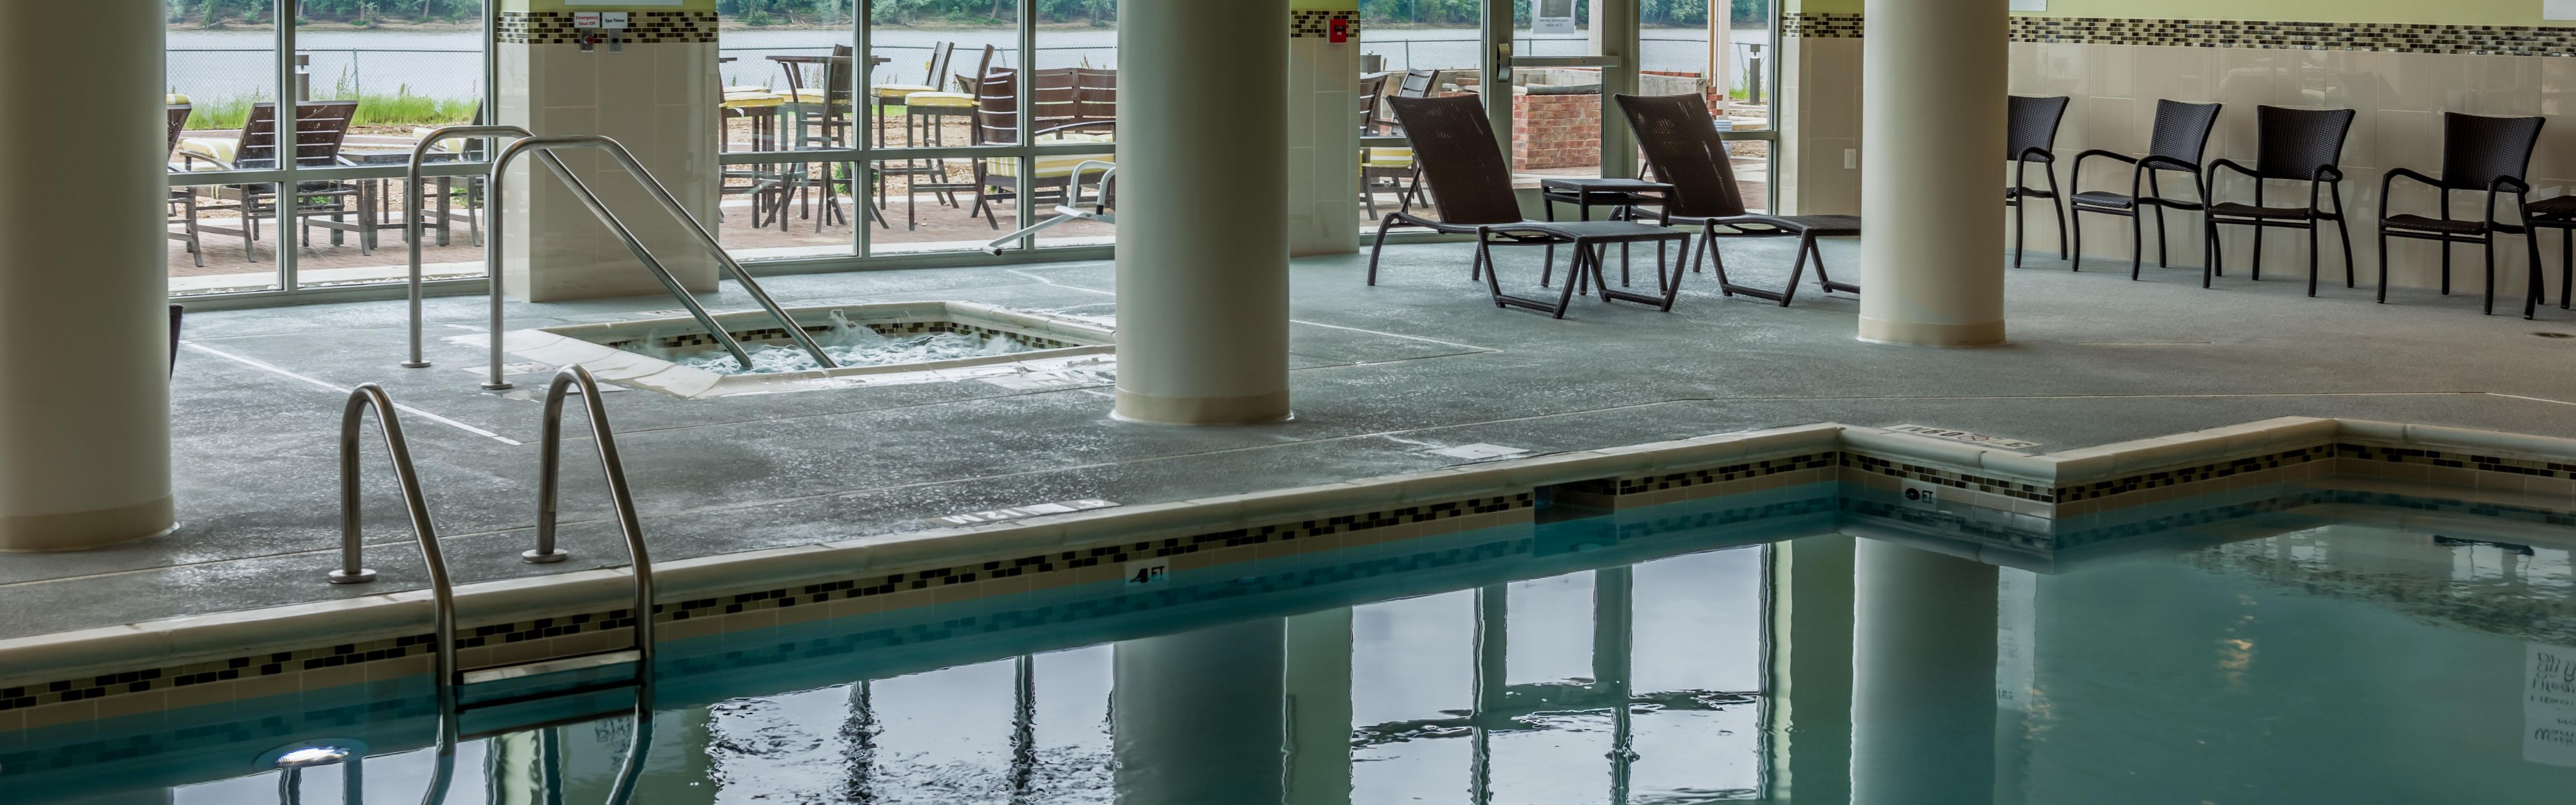 Holiday Inn Owensboro Riverfront image 2